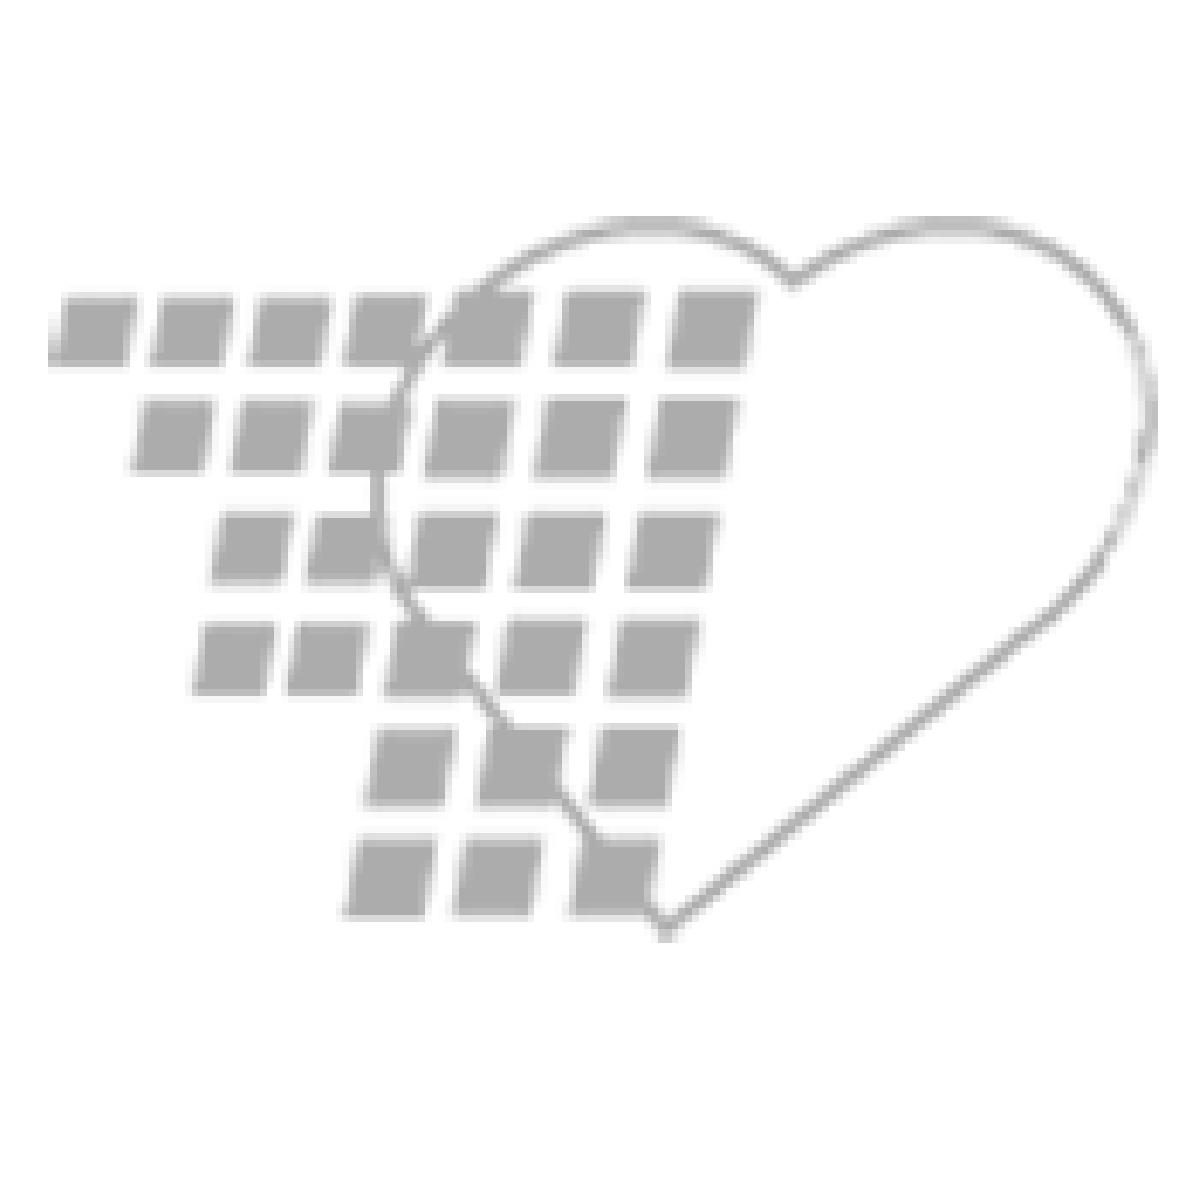 02-70-4070-INFNT - Satin   MacIntosh Blade #1